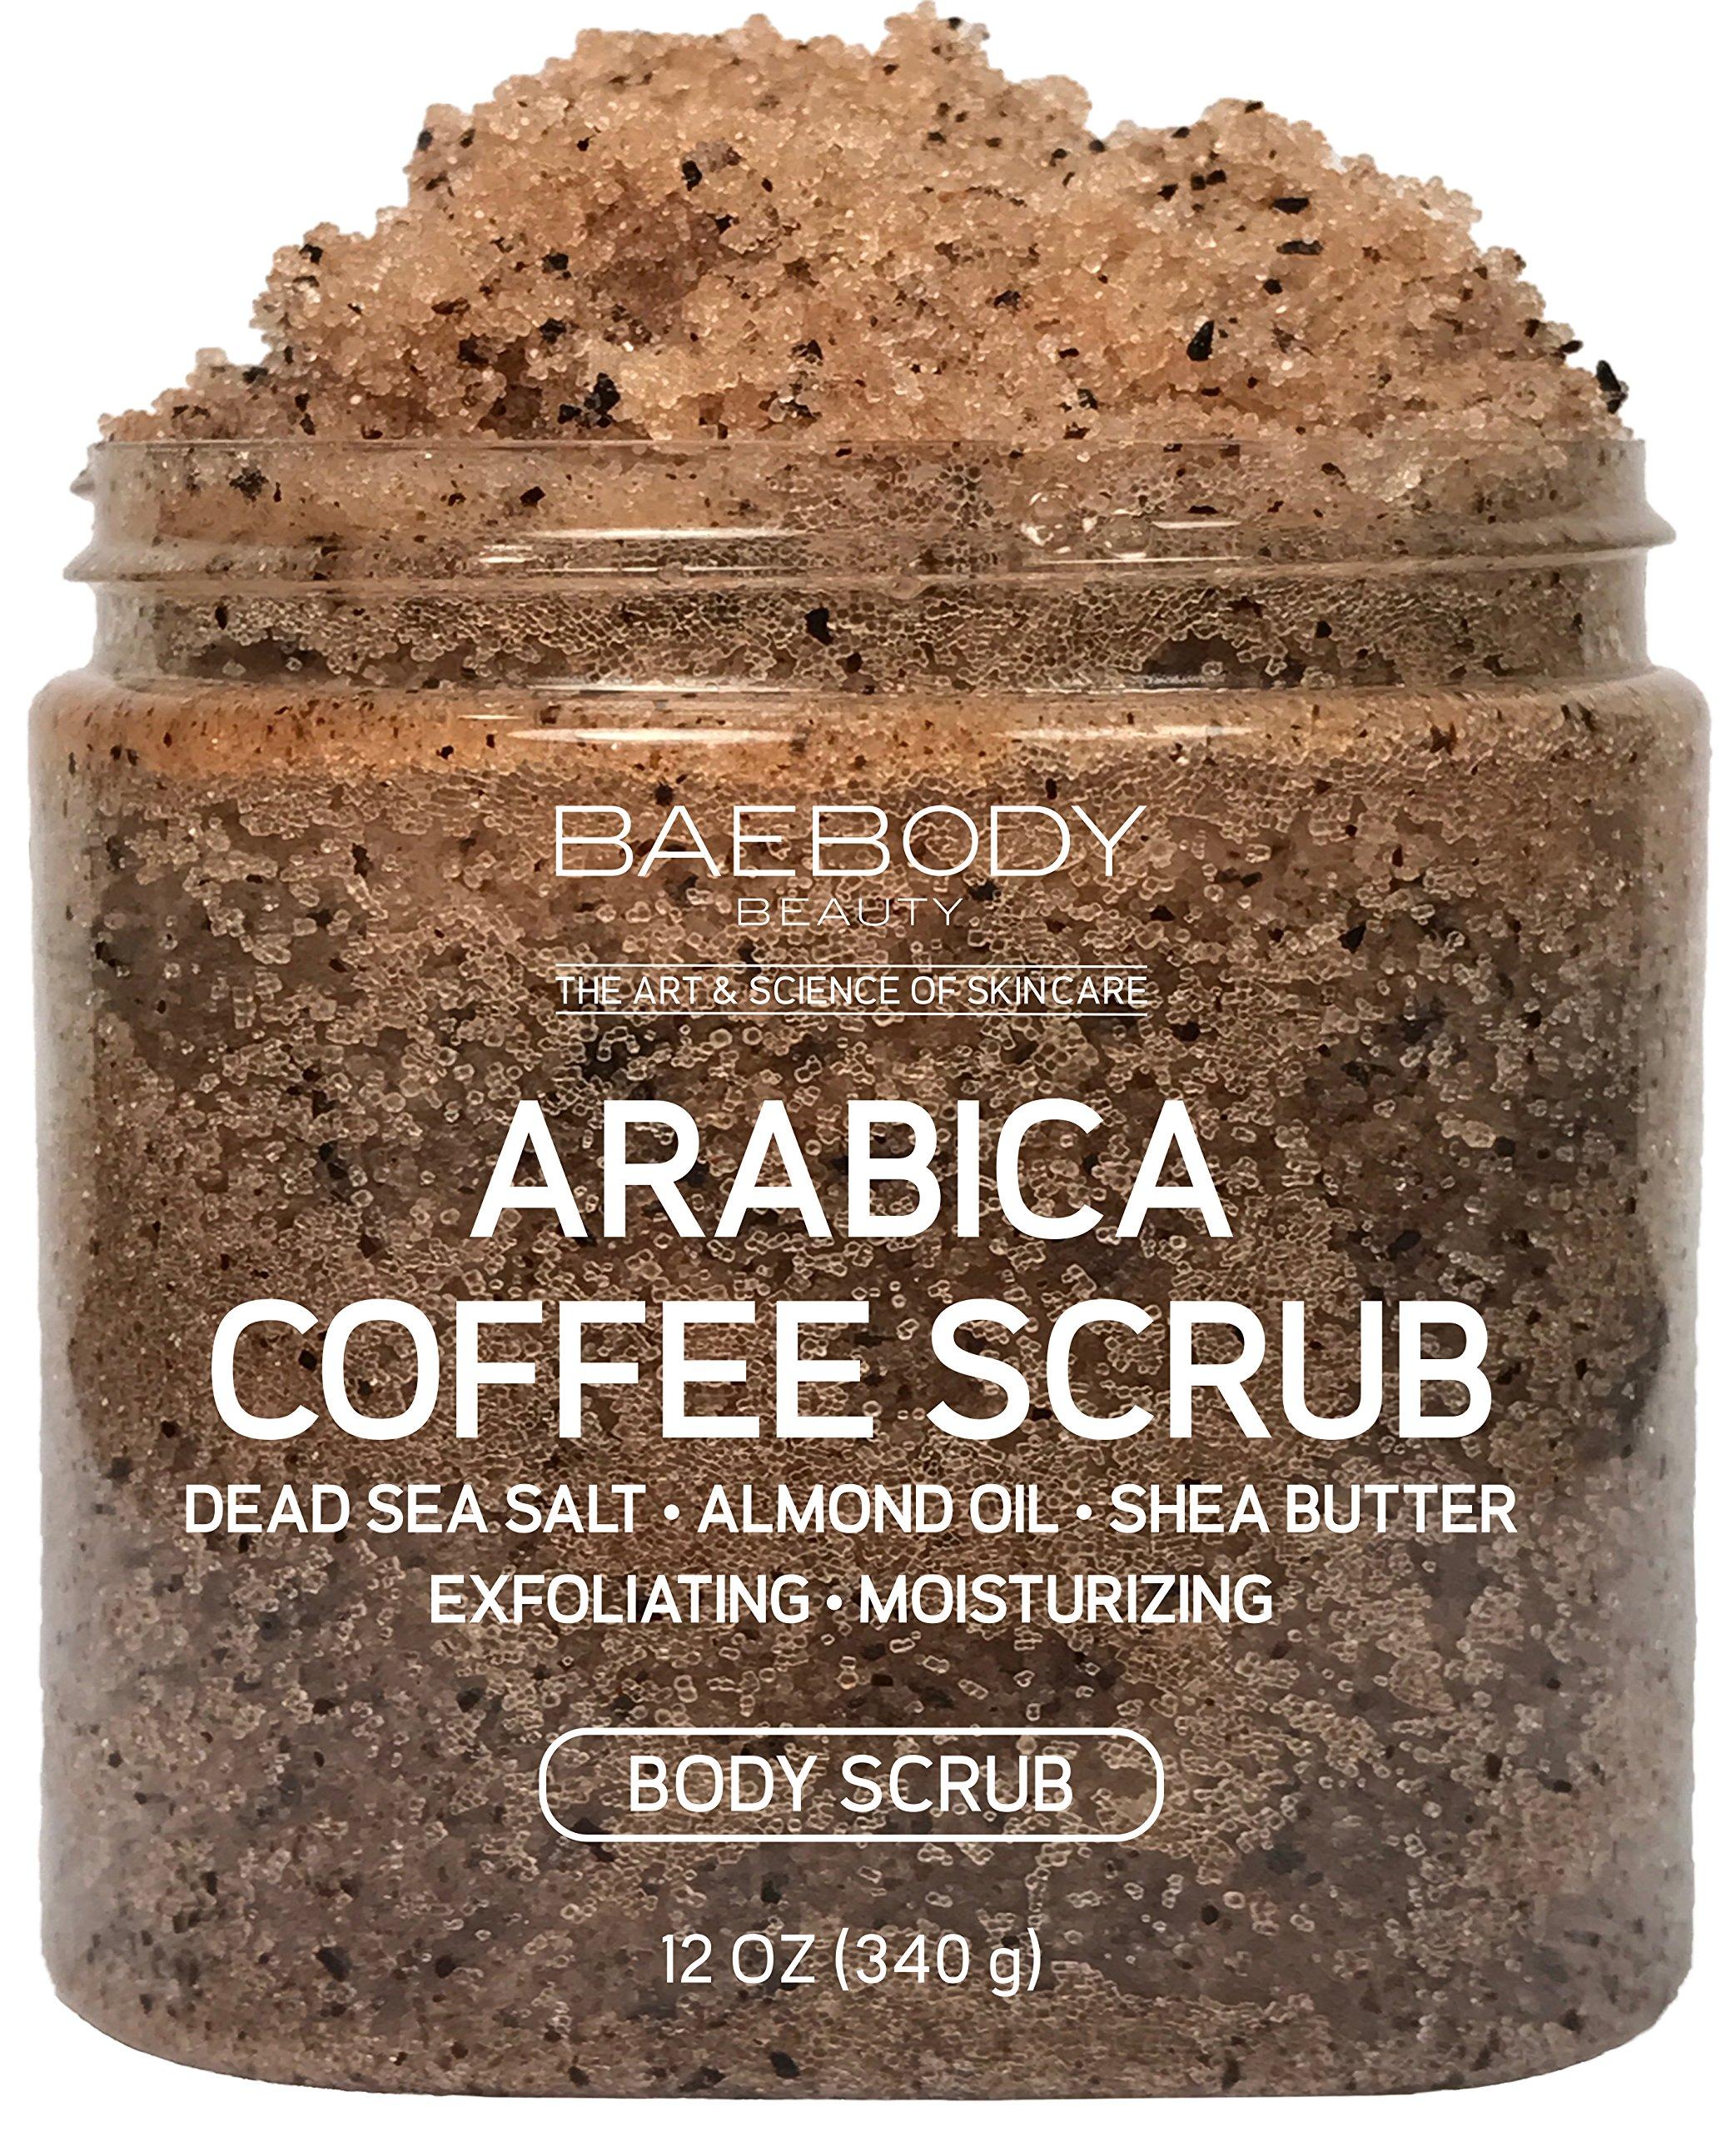 Baebody Arabica Coffee Scrub - With Dead Sea Salt, Olive Oil, and Shea Butter. Exfoliator, Moisturizer Promoting Radiant Skin 12oz